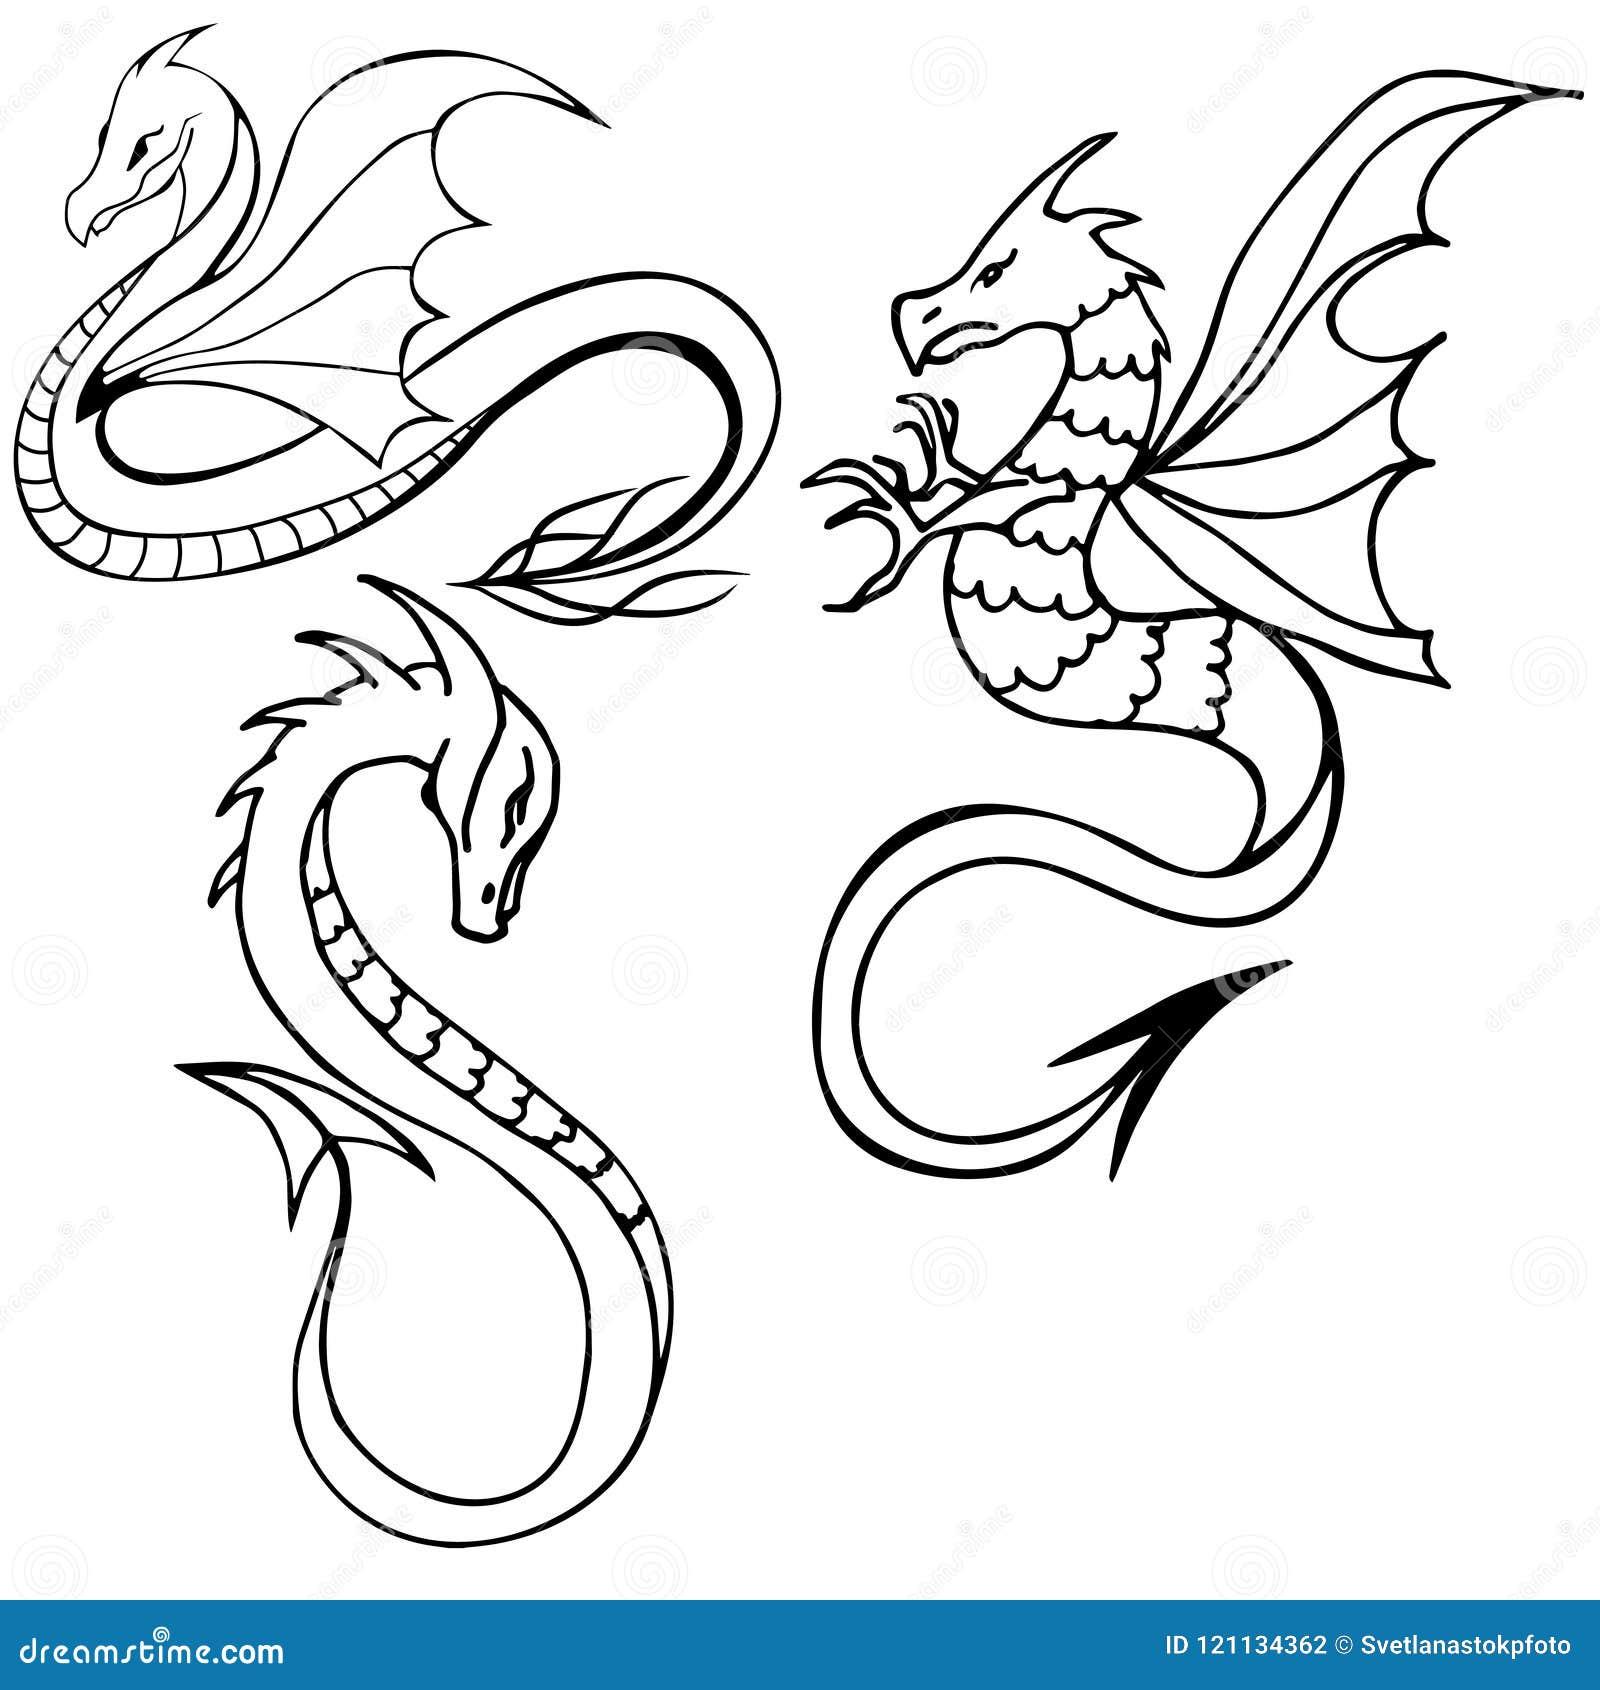 dragon tattoo tribal dragon set three dragons black and white